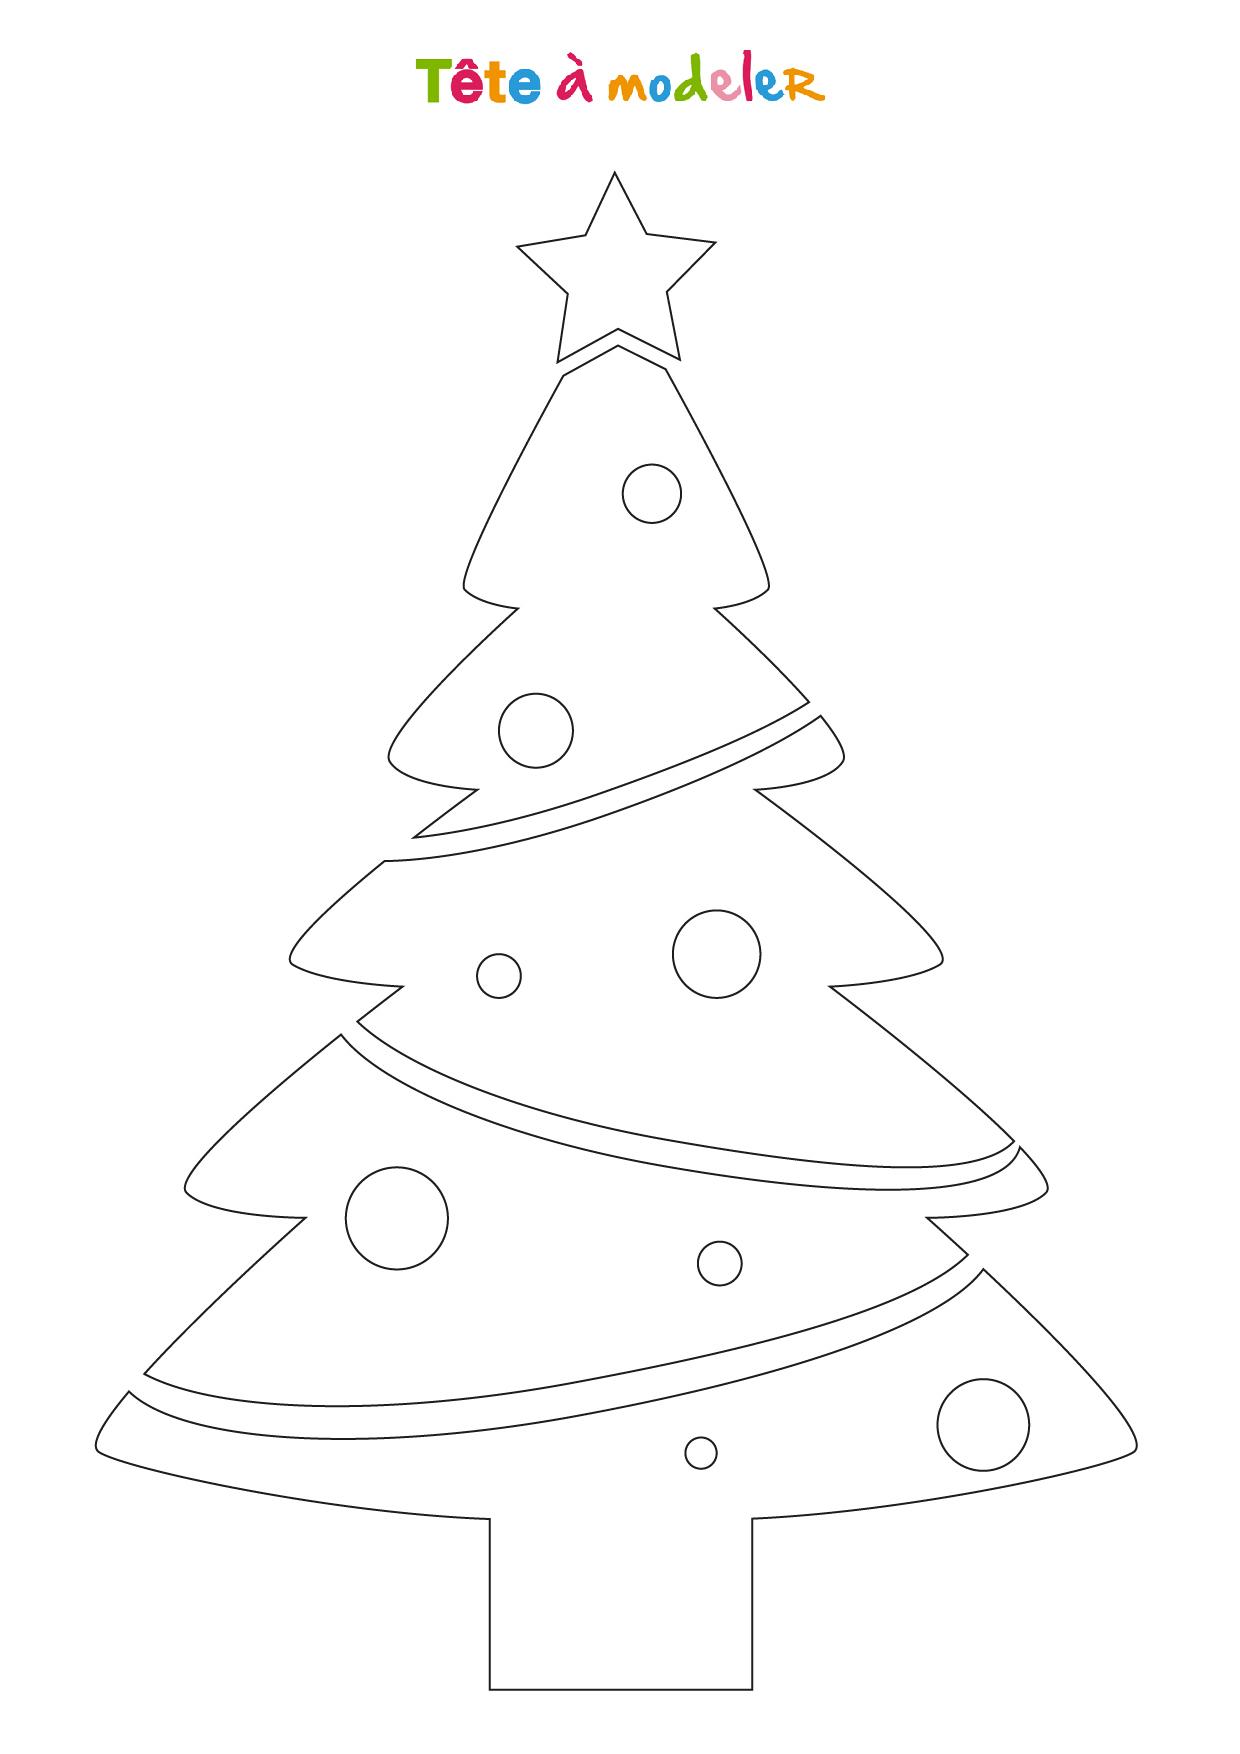 Pochoir Sapin De Noël 2L À Imprimer - Tête À Modeler à Gabarit Sapin De Noel A Imprimer